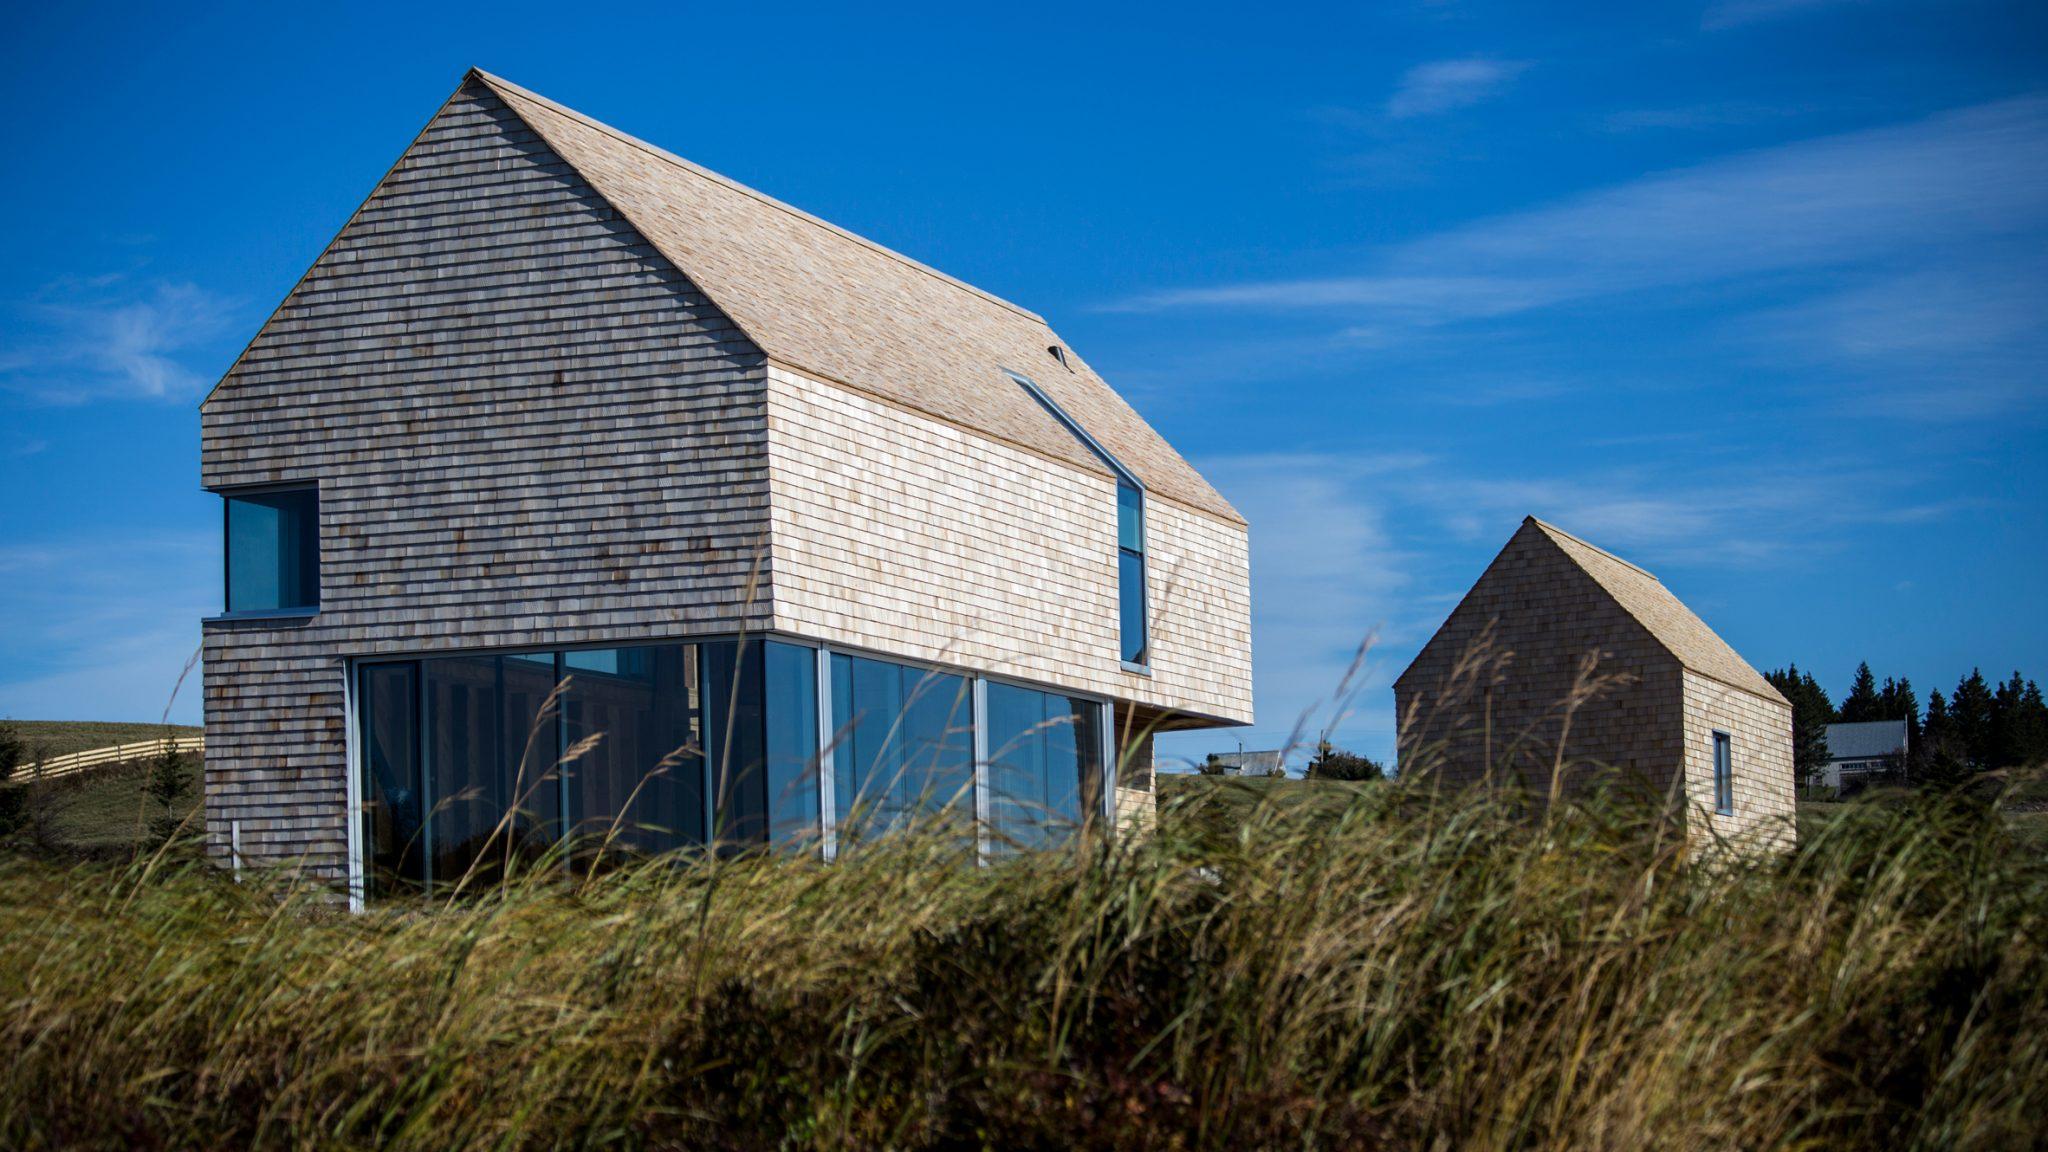 dreamy coastal house by studio mackay lyons sweetapple 1 Dreamy Coastal House by Studio MacKay Lyons Sweetapple